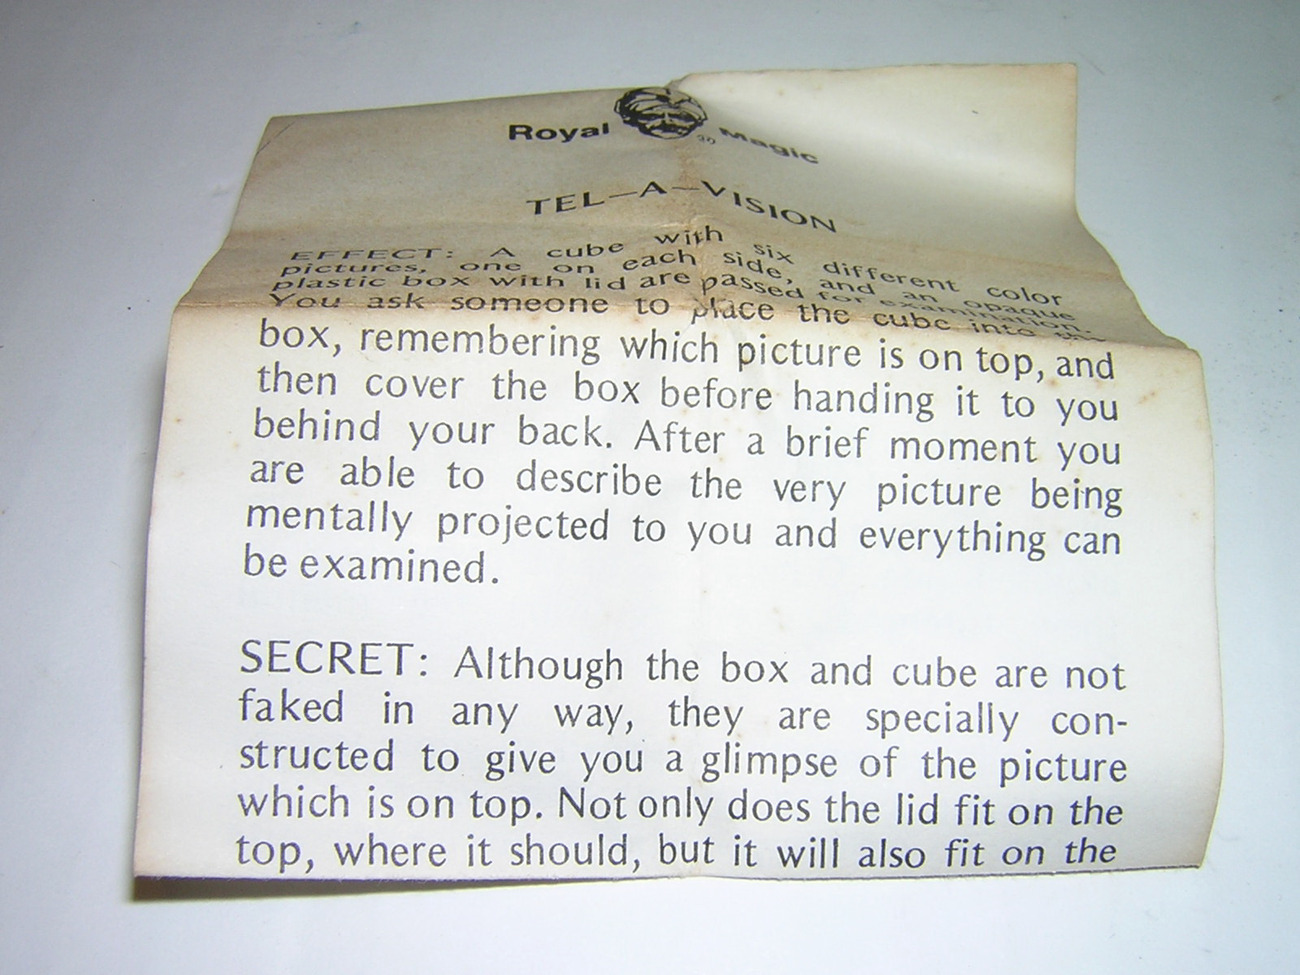 Royal Magic Tel-a-vision box E.S.P. Magic Trick